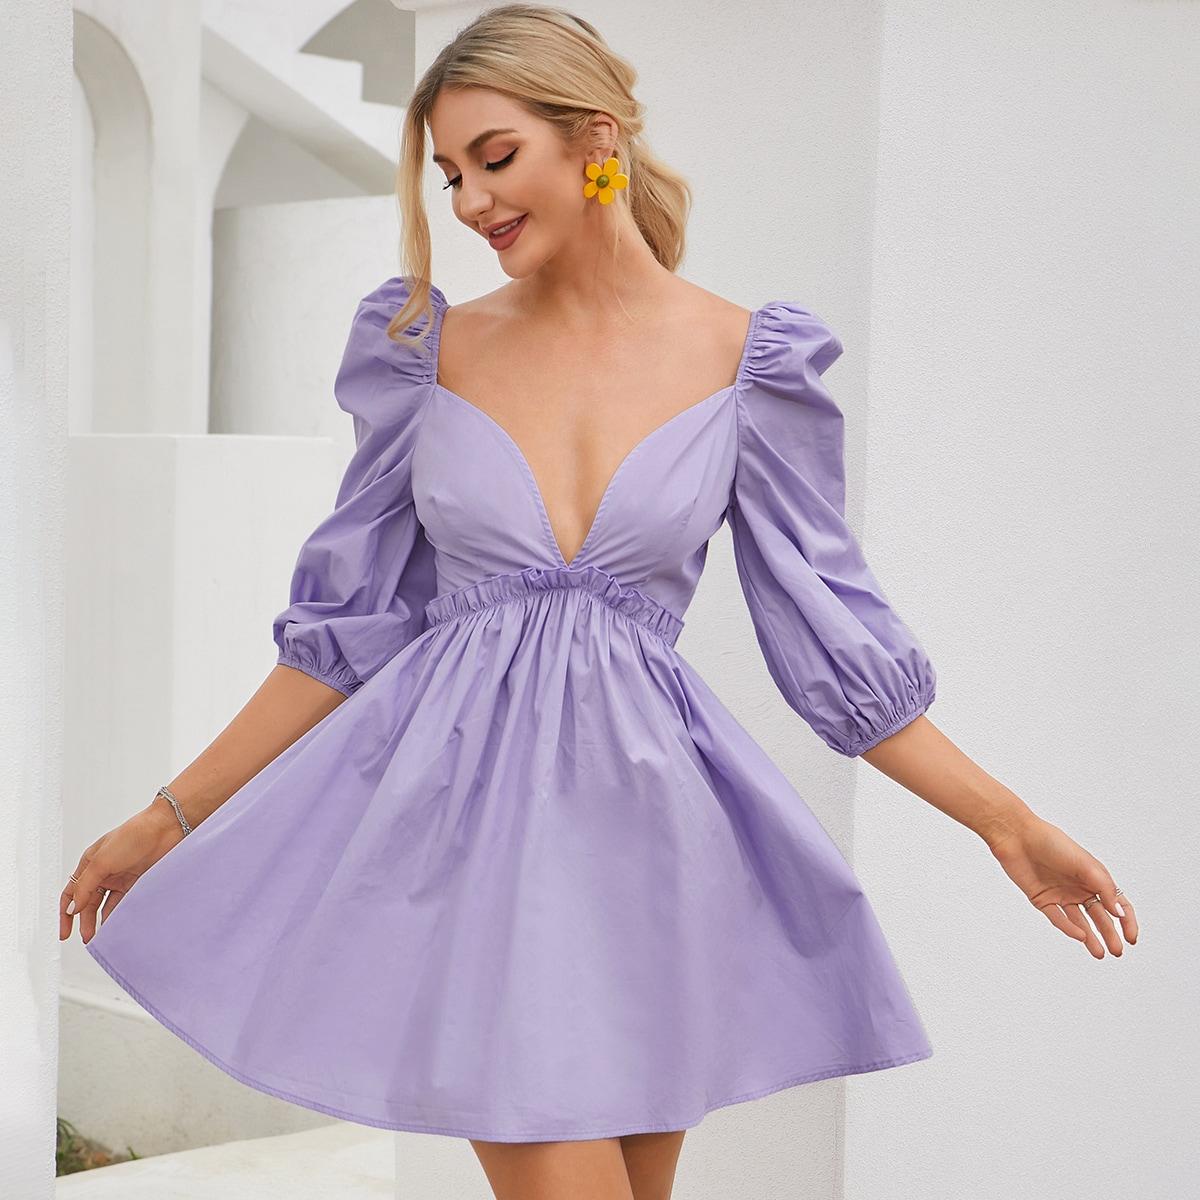 Plunging Neck Lantern Sleeve Frill Dress